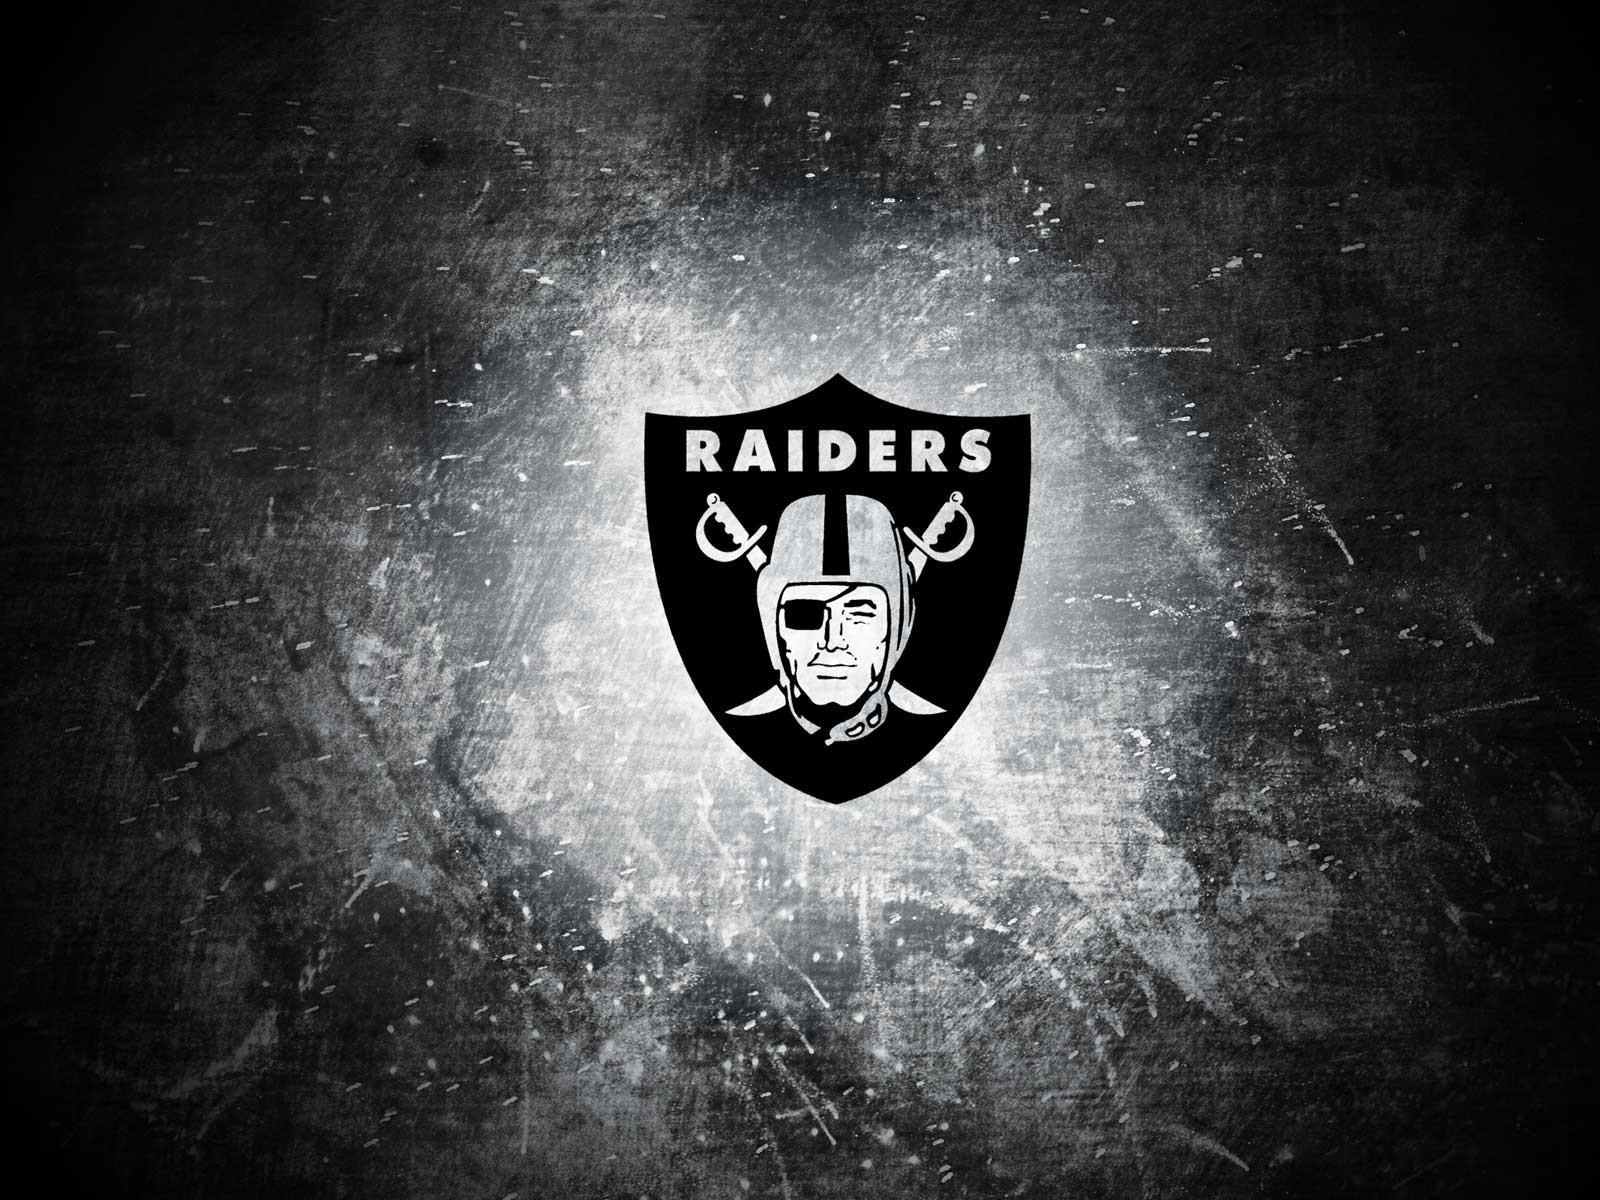 Oakland raiders logo wallpaper 85745 1600x1200